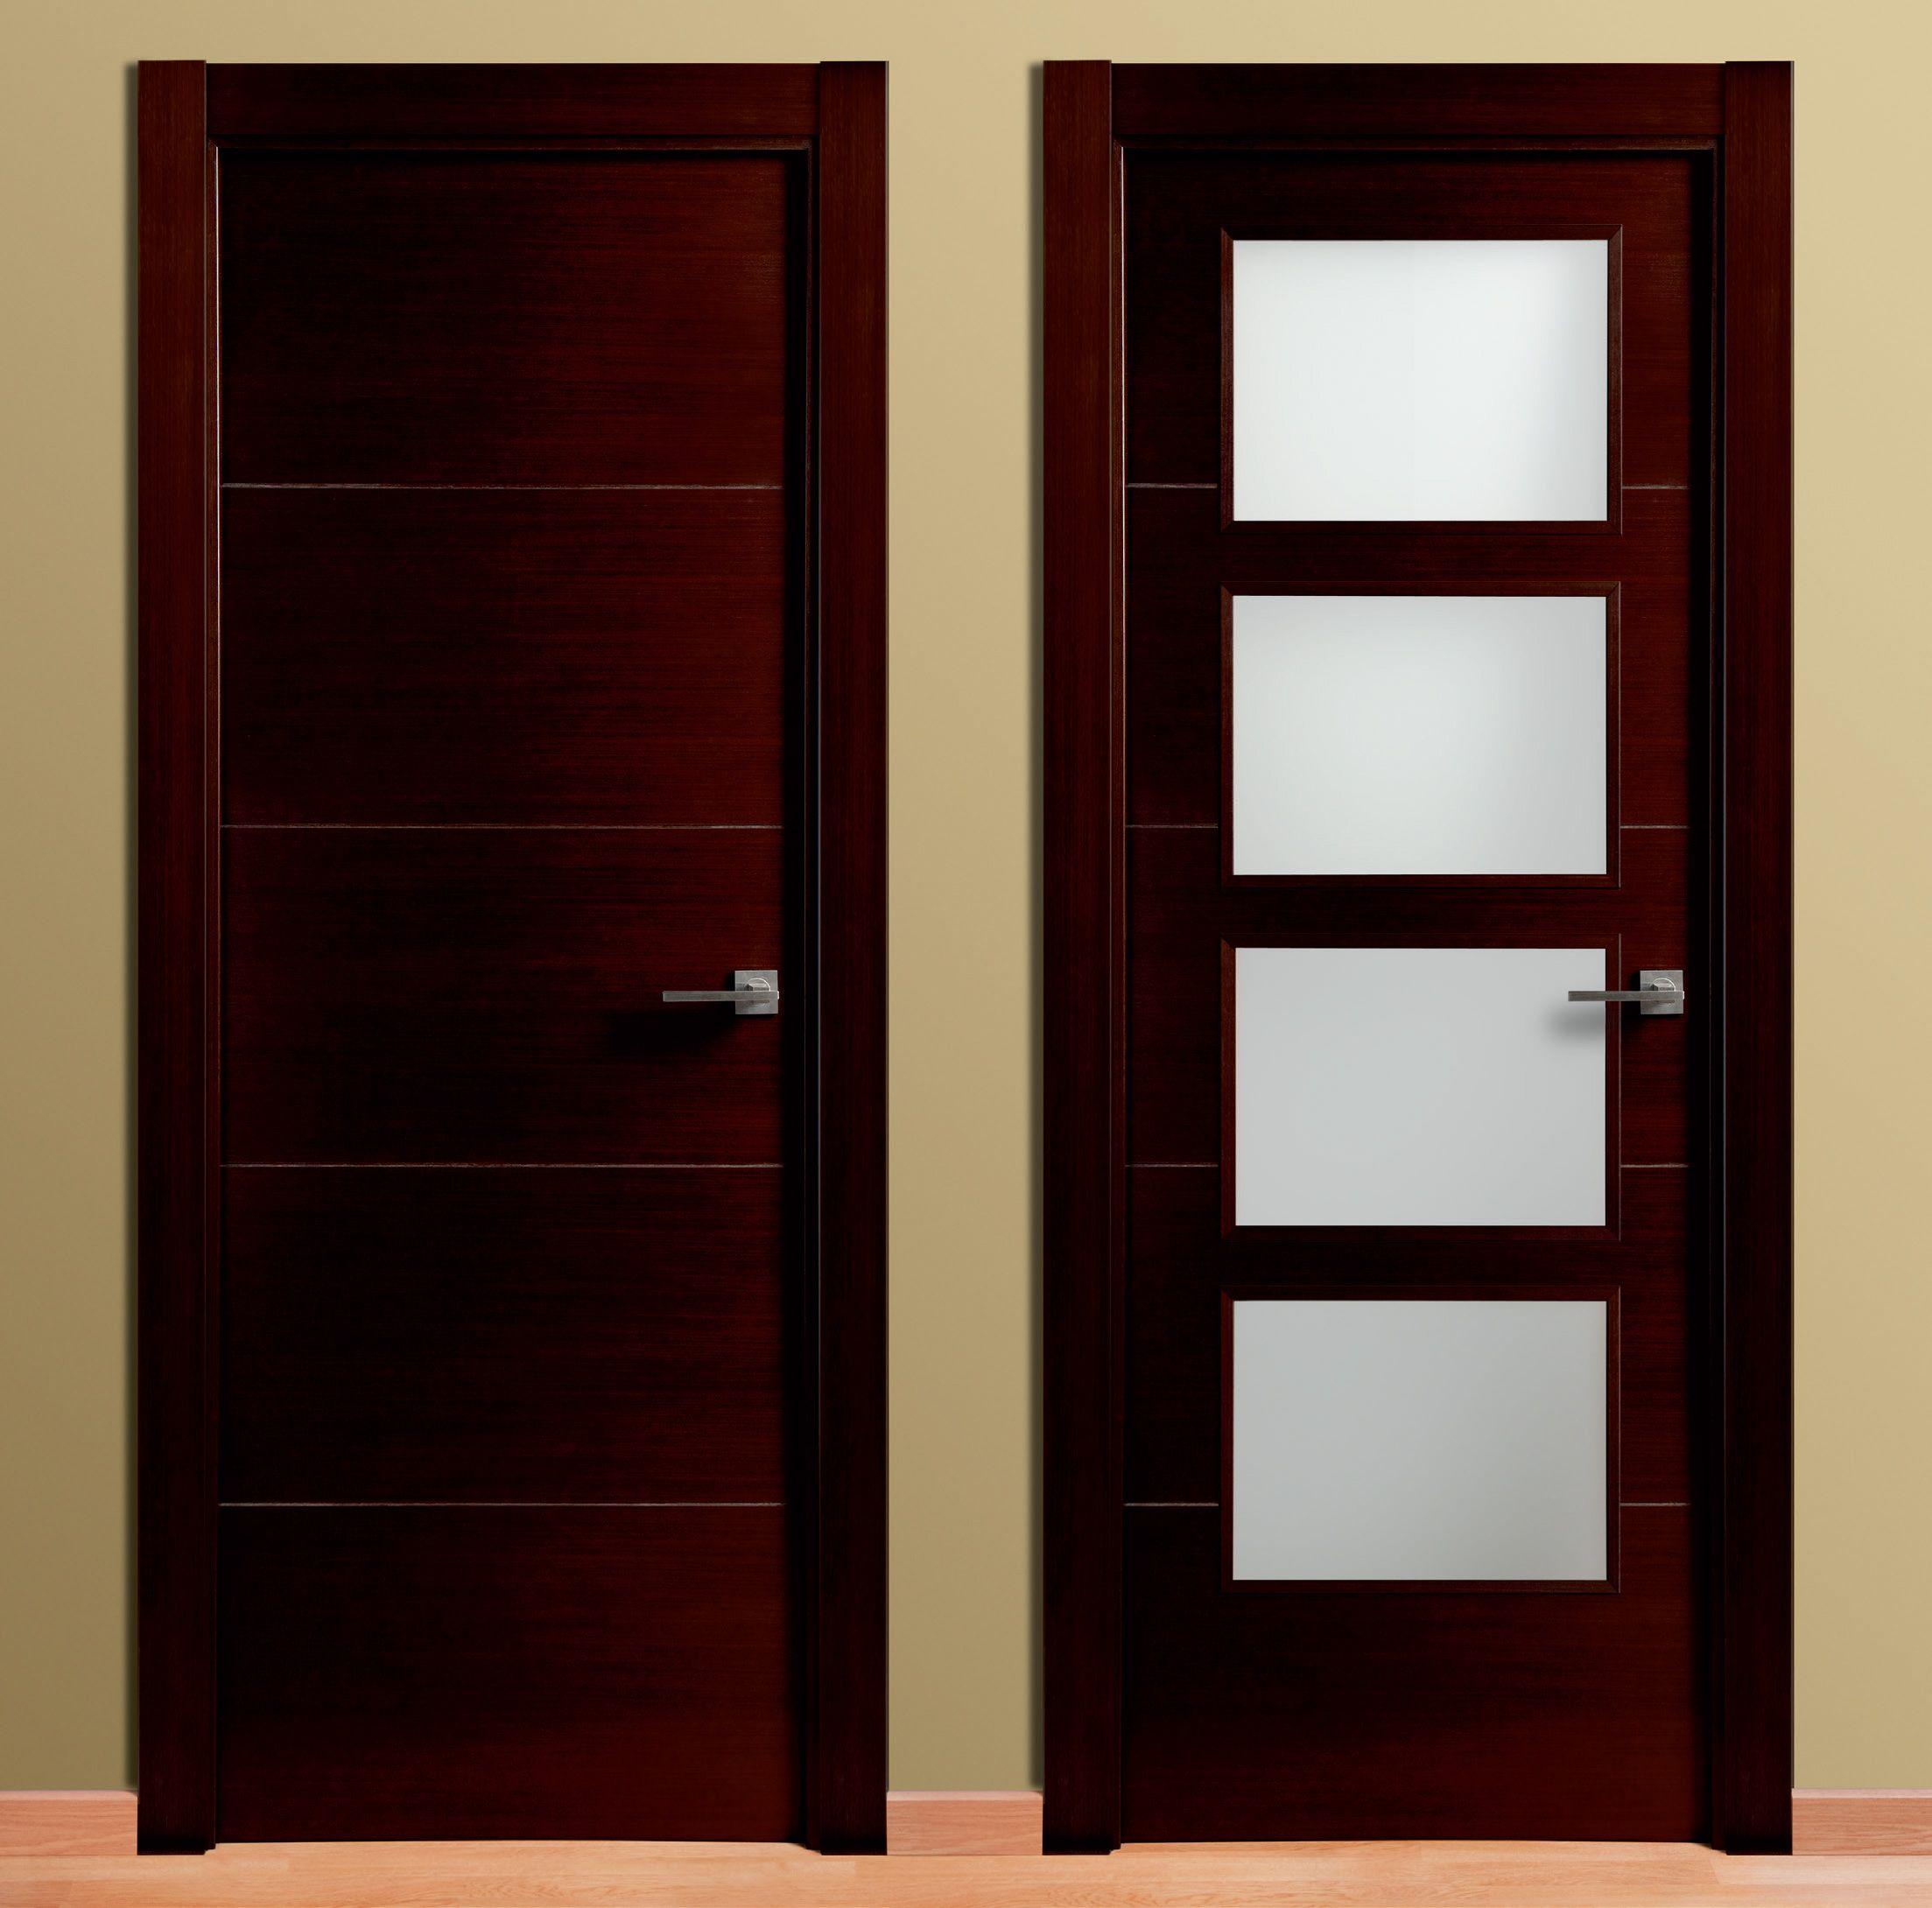 Puerta 4 ranuras en madera puertas carsal socios aitim for Puertas pivotantes madera